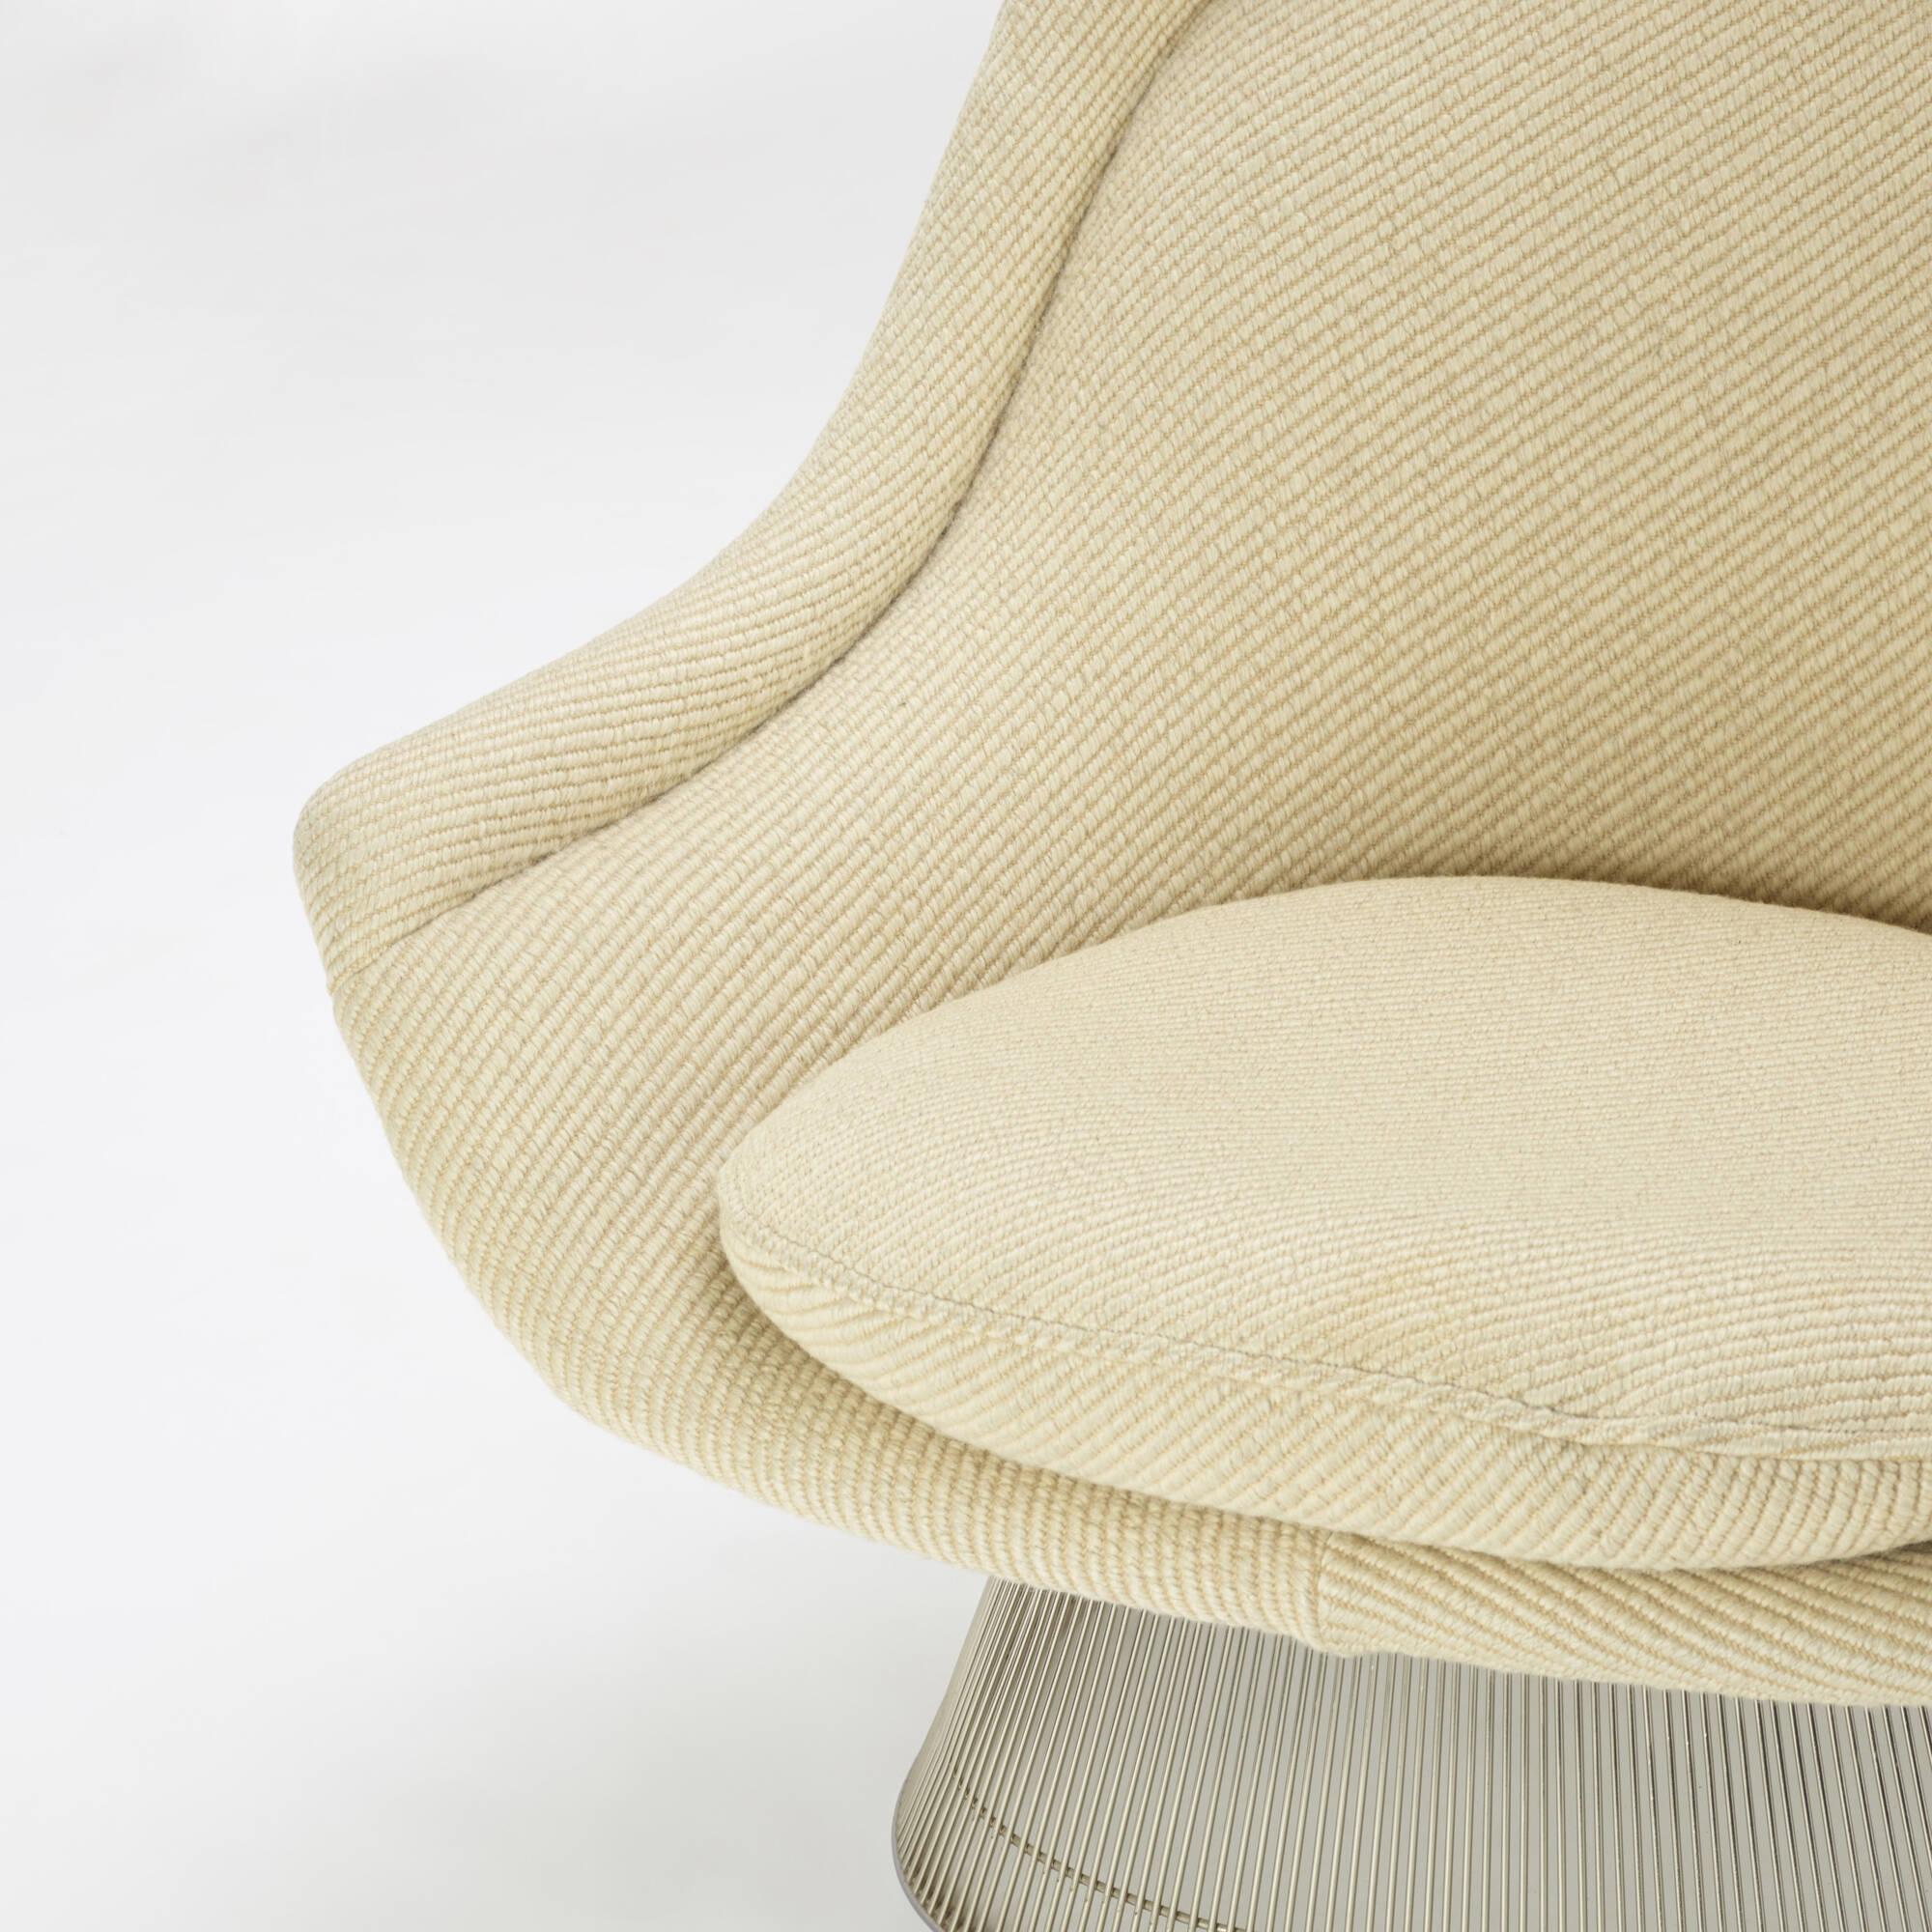 296: Warren Platner / lounge chairs, pair (3 of 4)